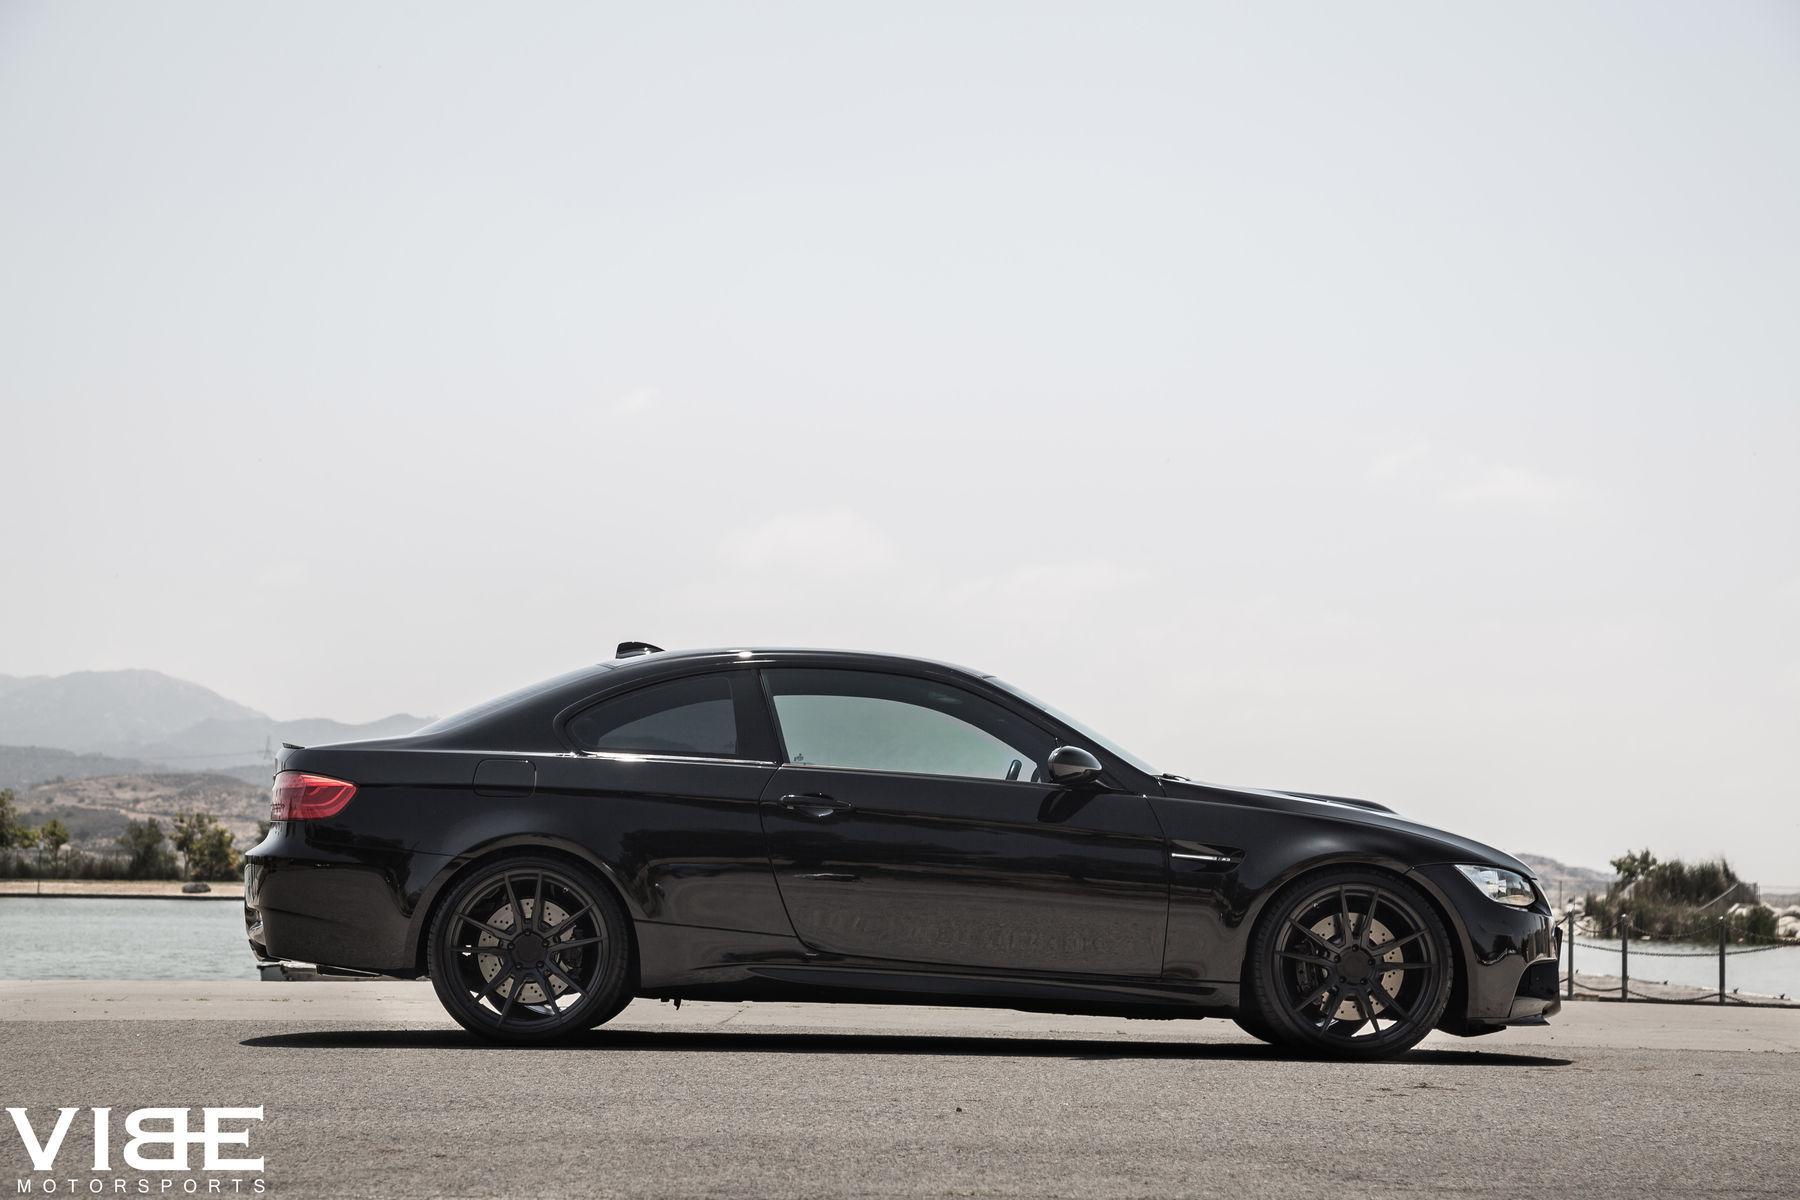 2012 BMW M3 | '12 E92 M3 on Rohana Wheels - Passenger Side Shot